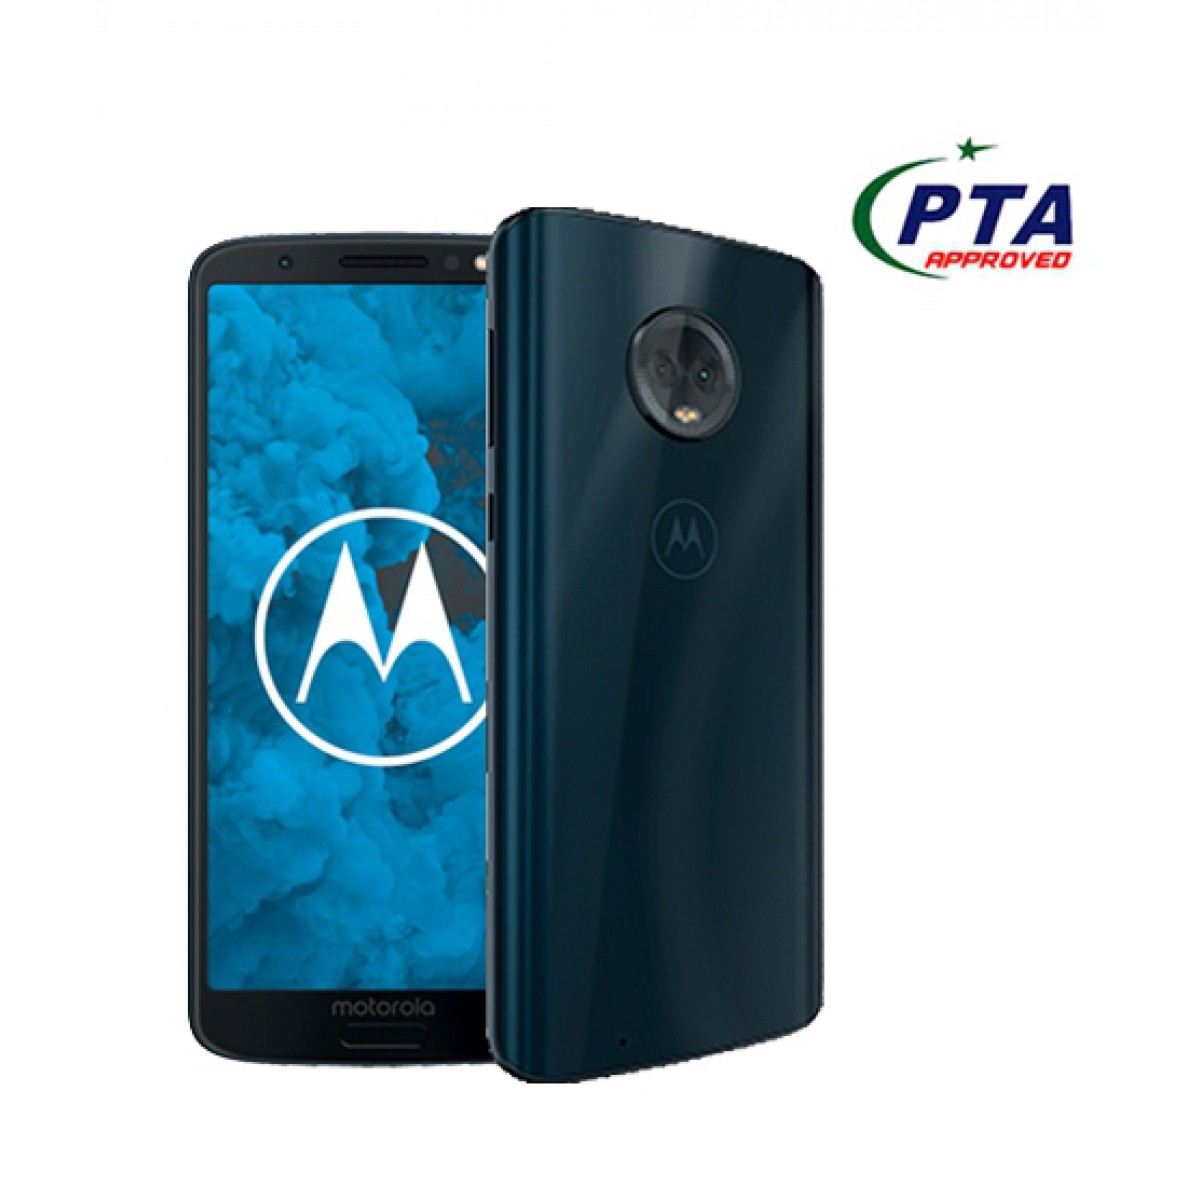 d20c4435c Motorola Moto G6 Plus Price in Pakistan - Home Shopping